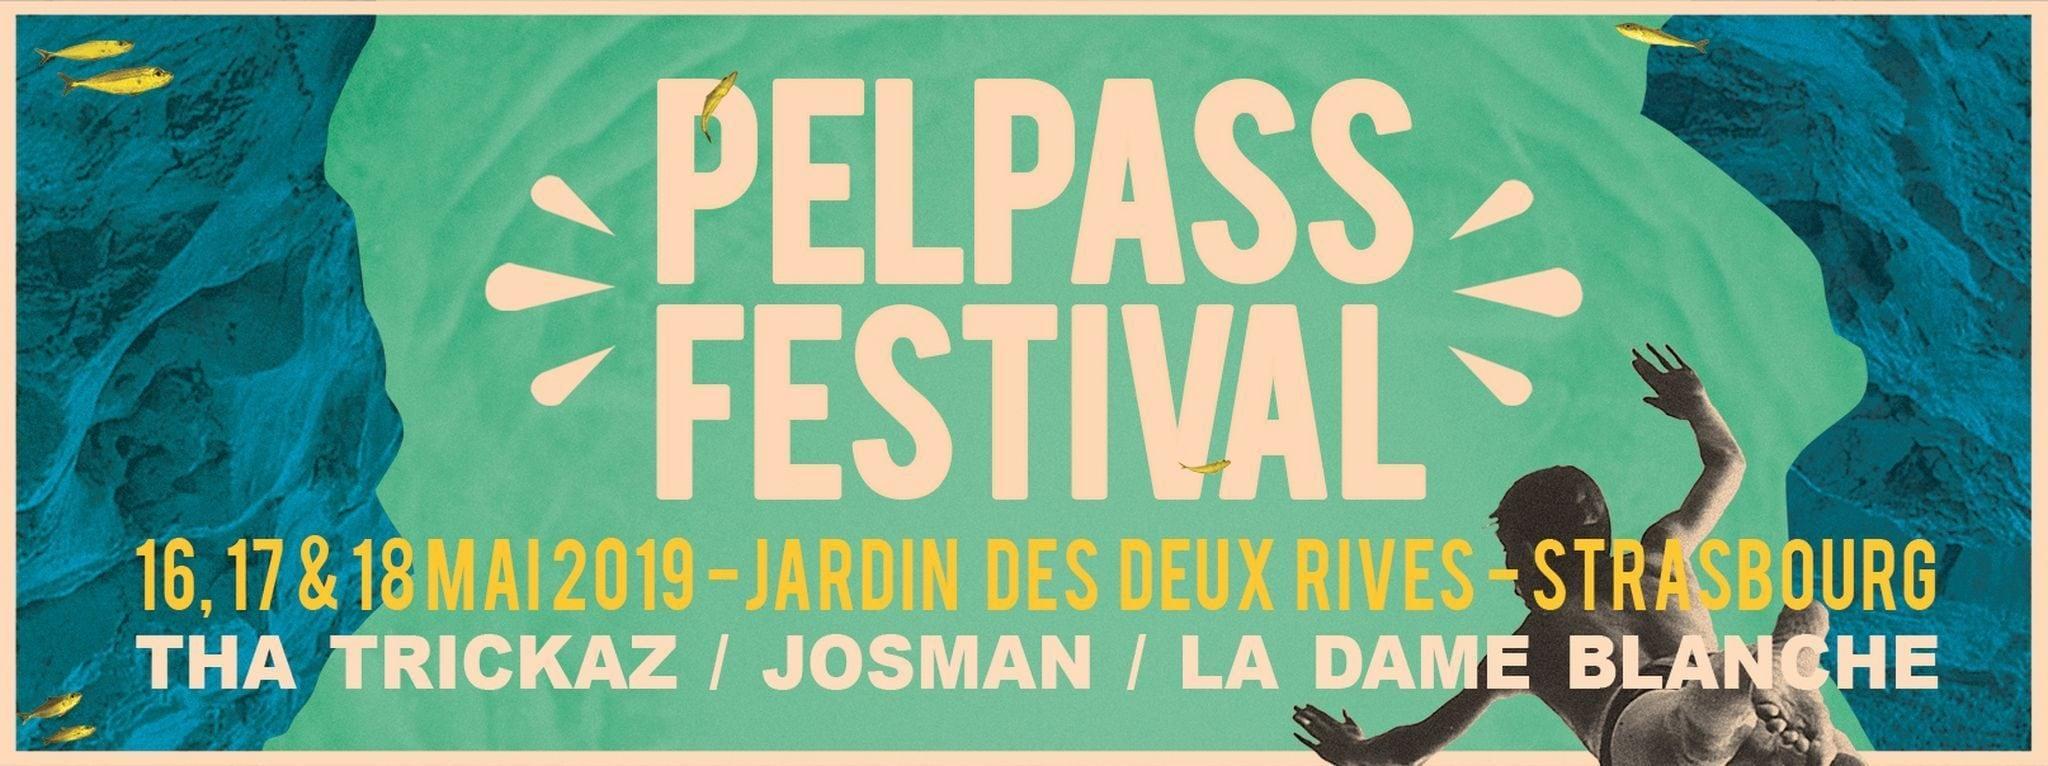 Tha Trickaz, Josman et La Dame Blanche au menu du Pelpass Festival 2019